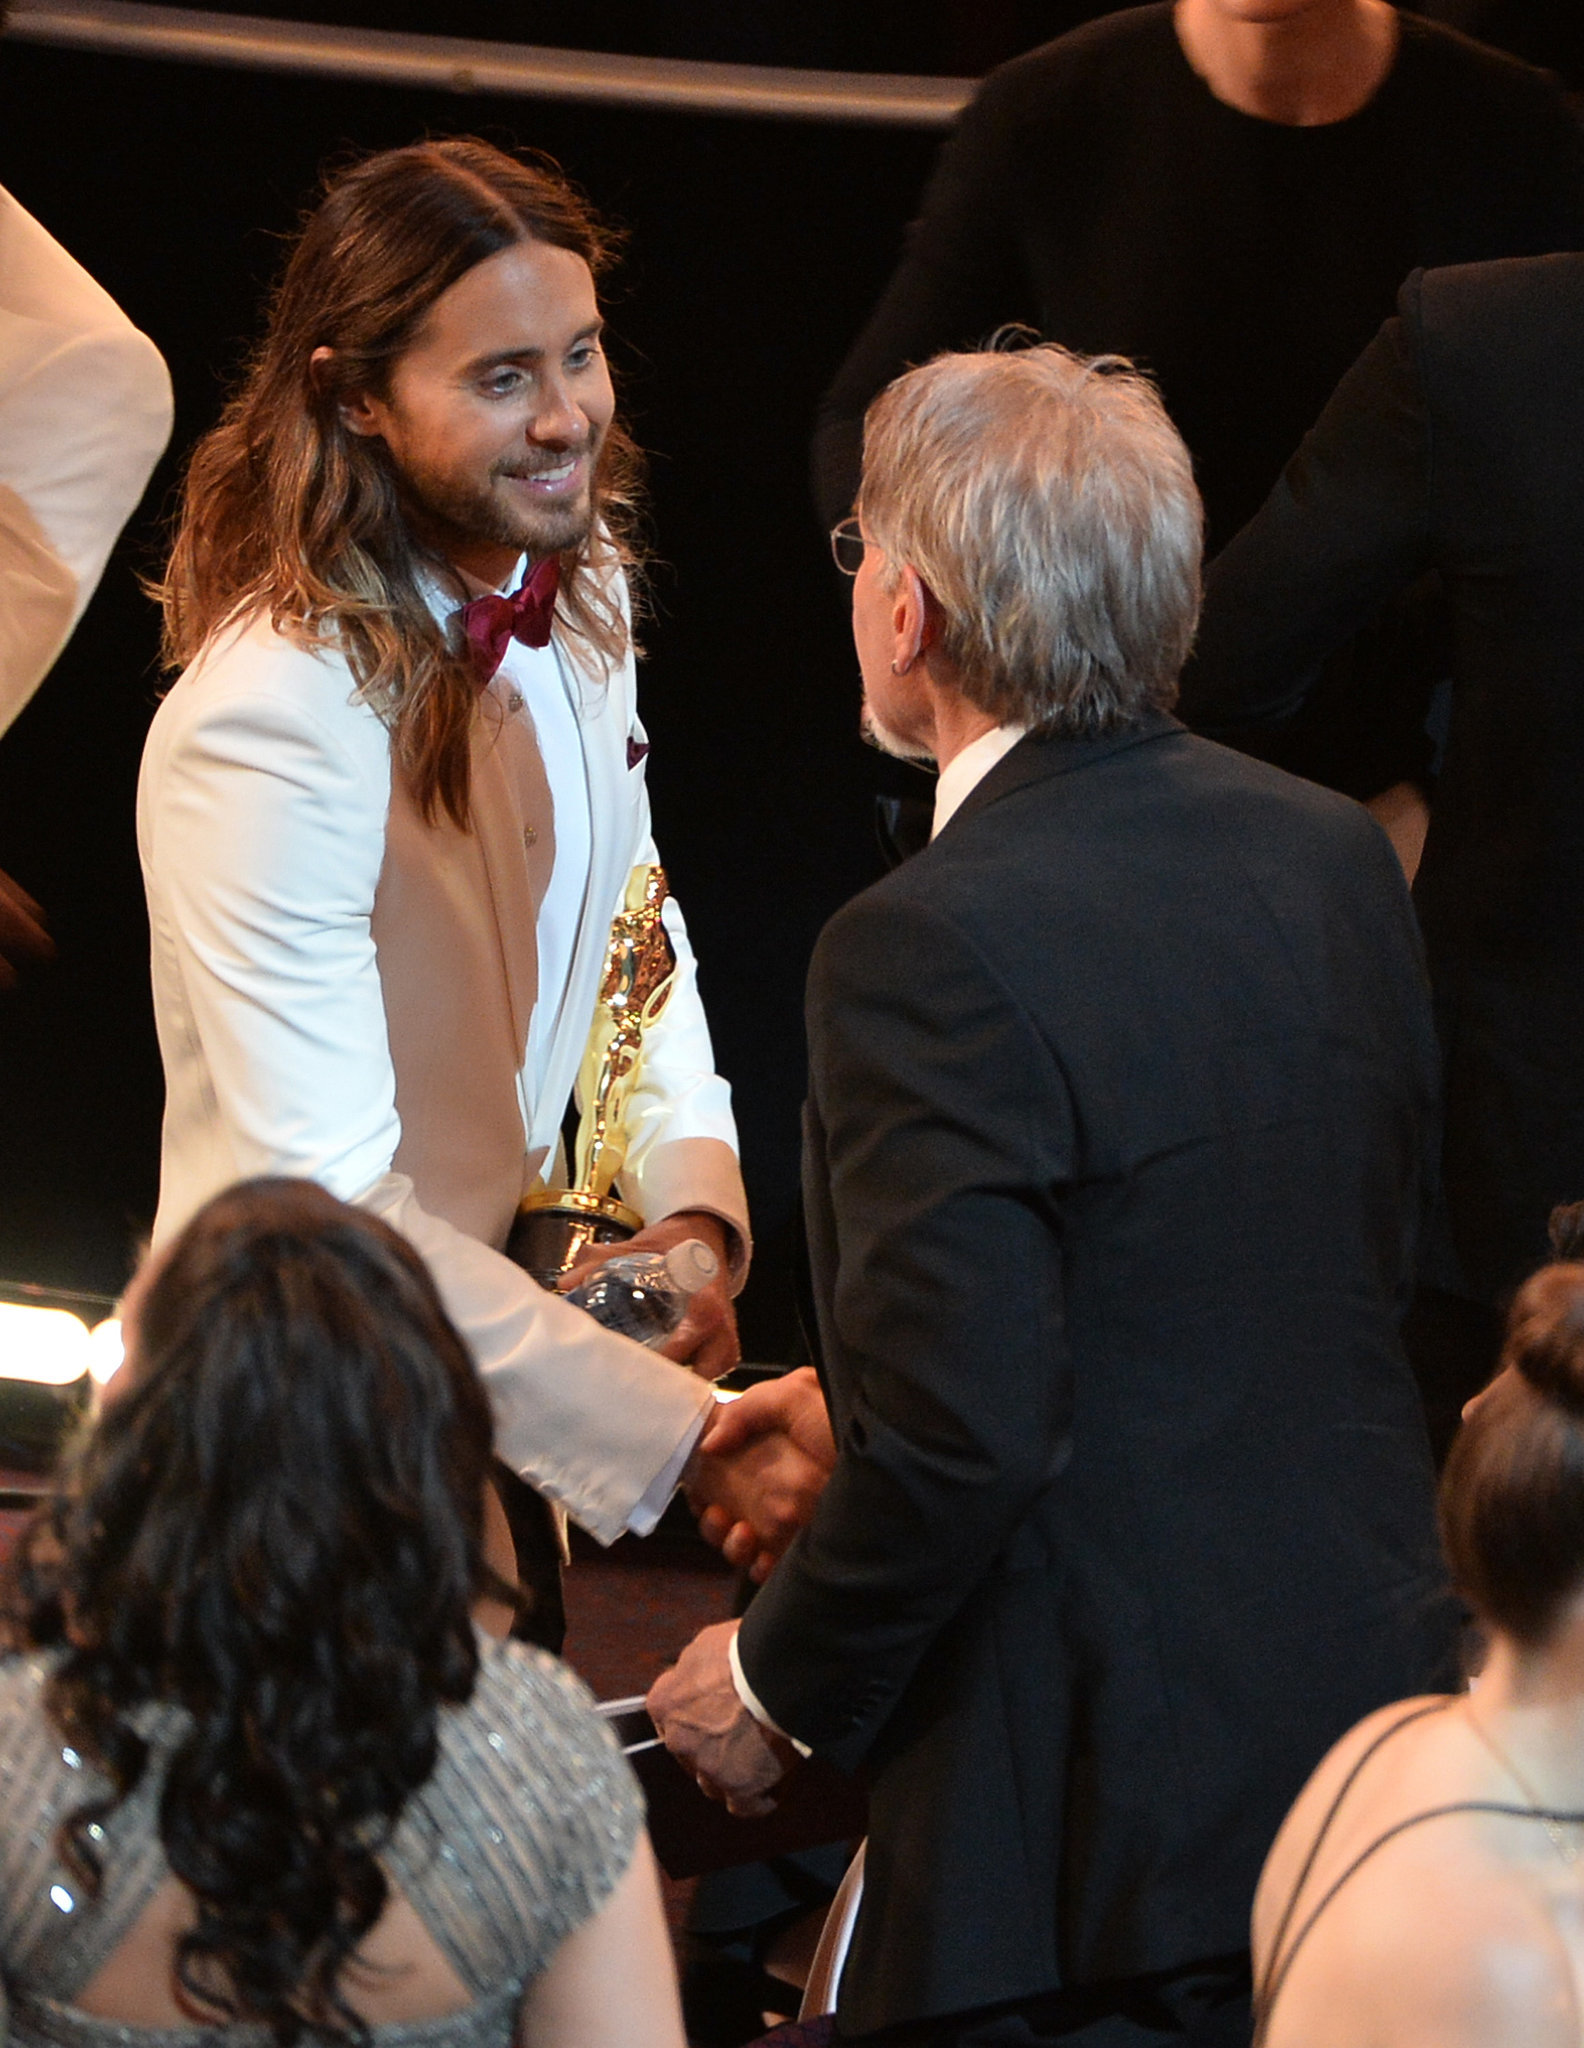 Harrison Ford congratulated Jared Leto on his Oscar win.